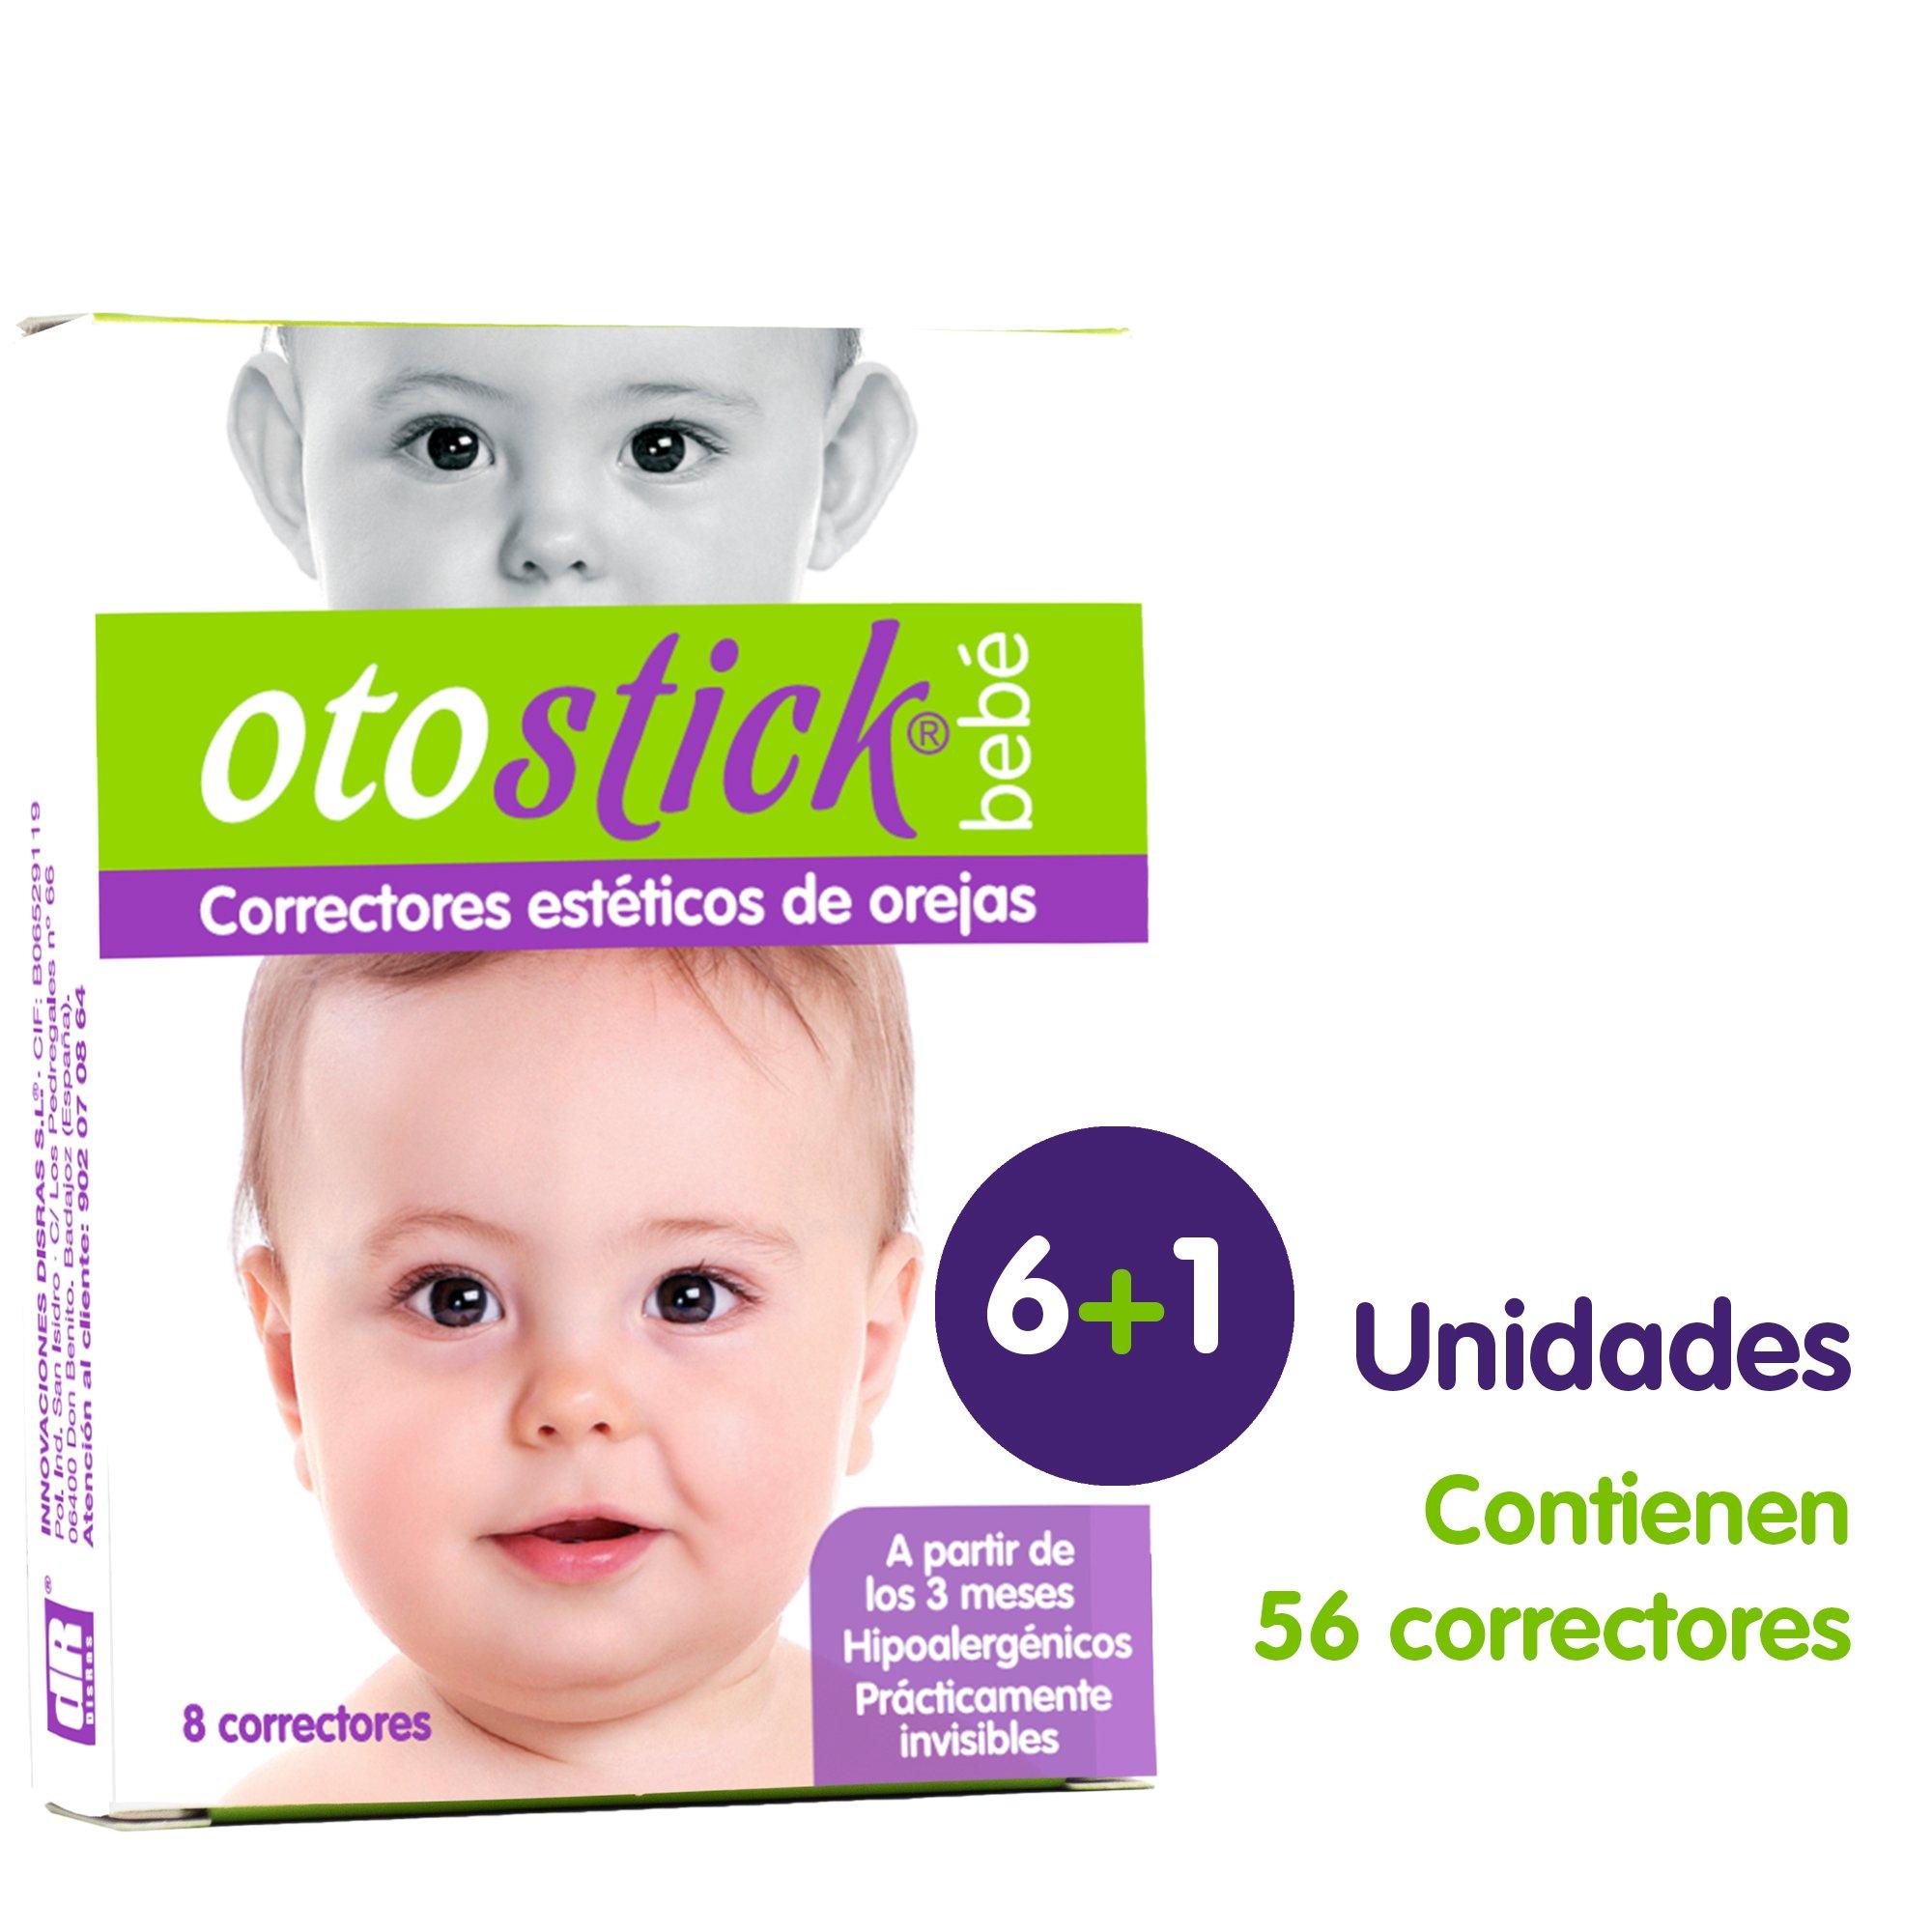 otostick-bebe-6+1